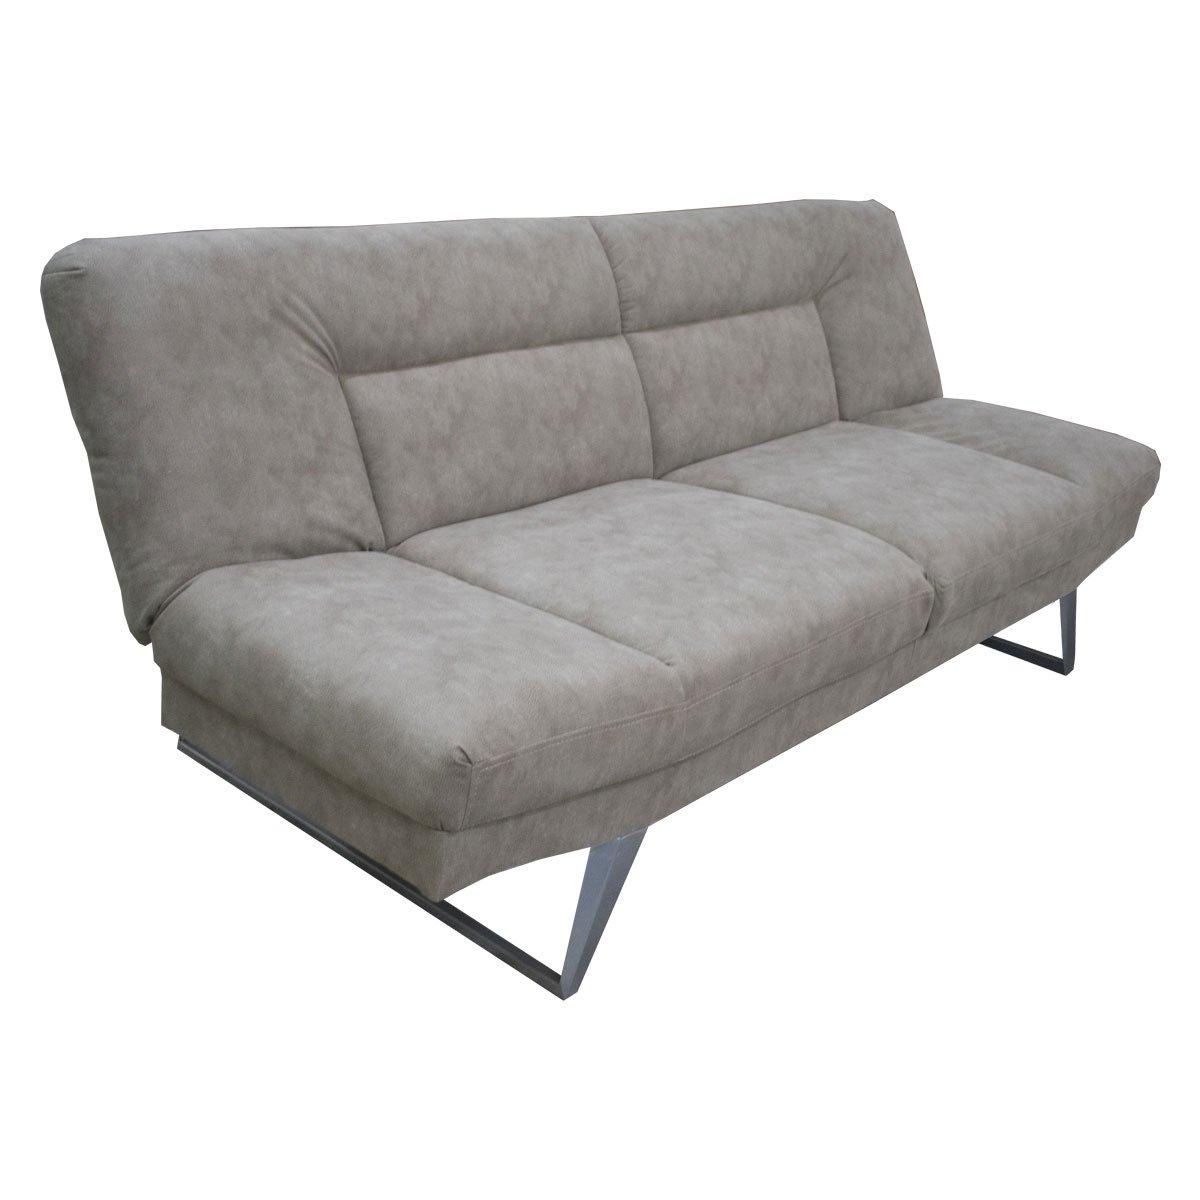 sofa cama individual mexico df danubio vs boston river sofascore sofá izco violanti sears com mx me entiende